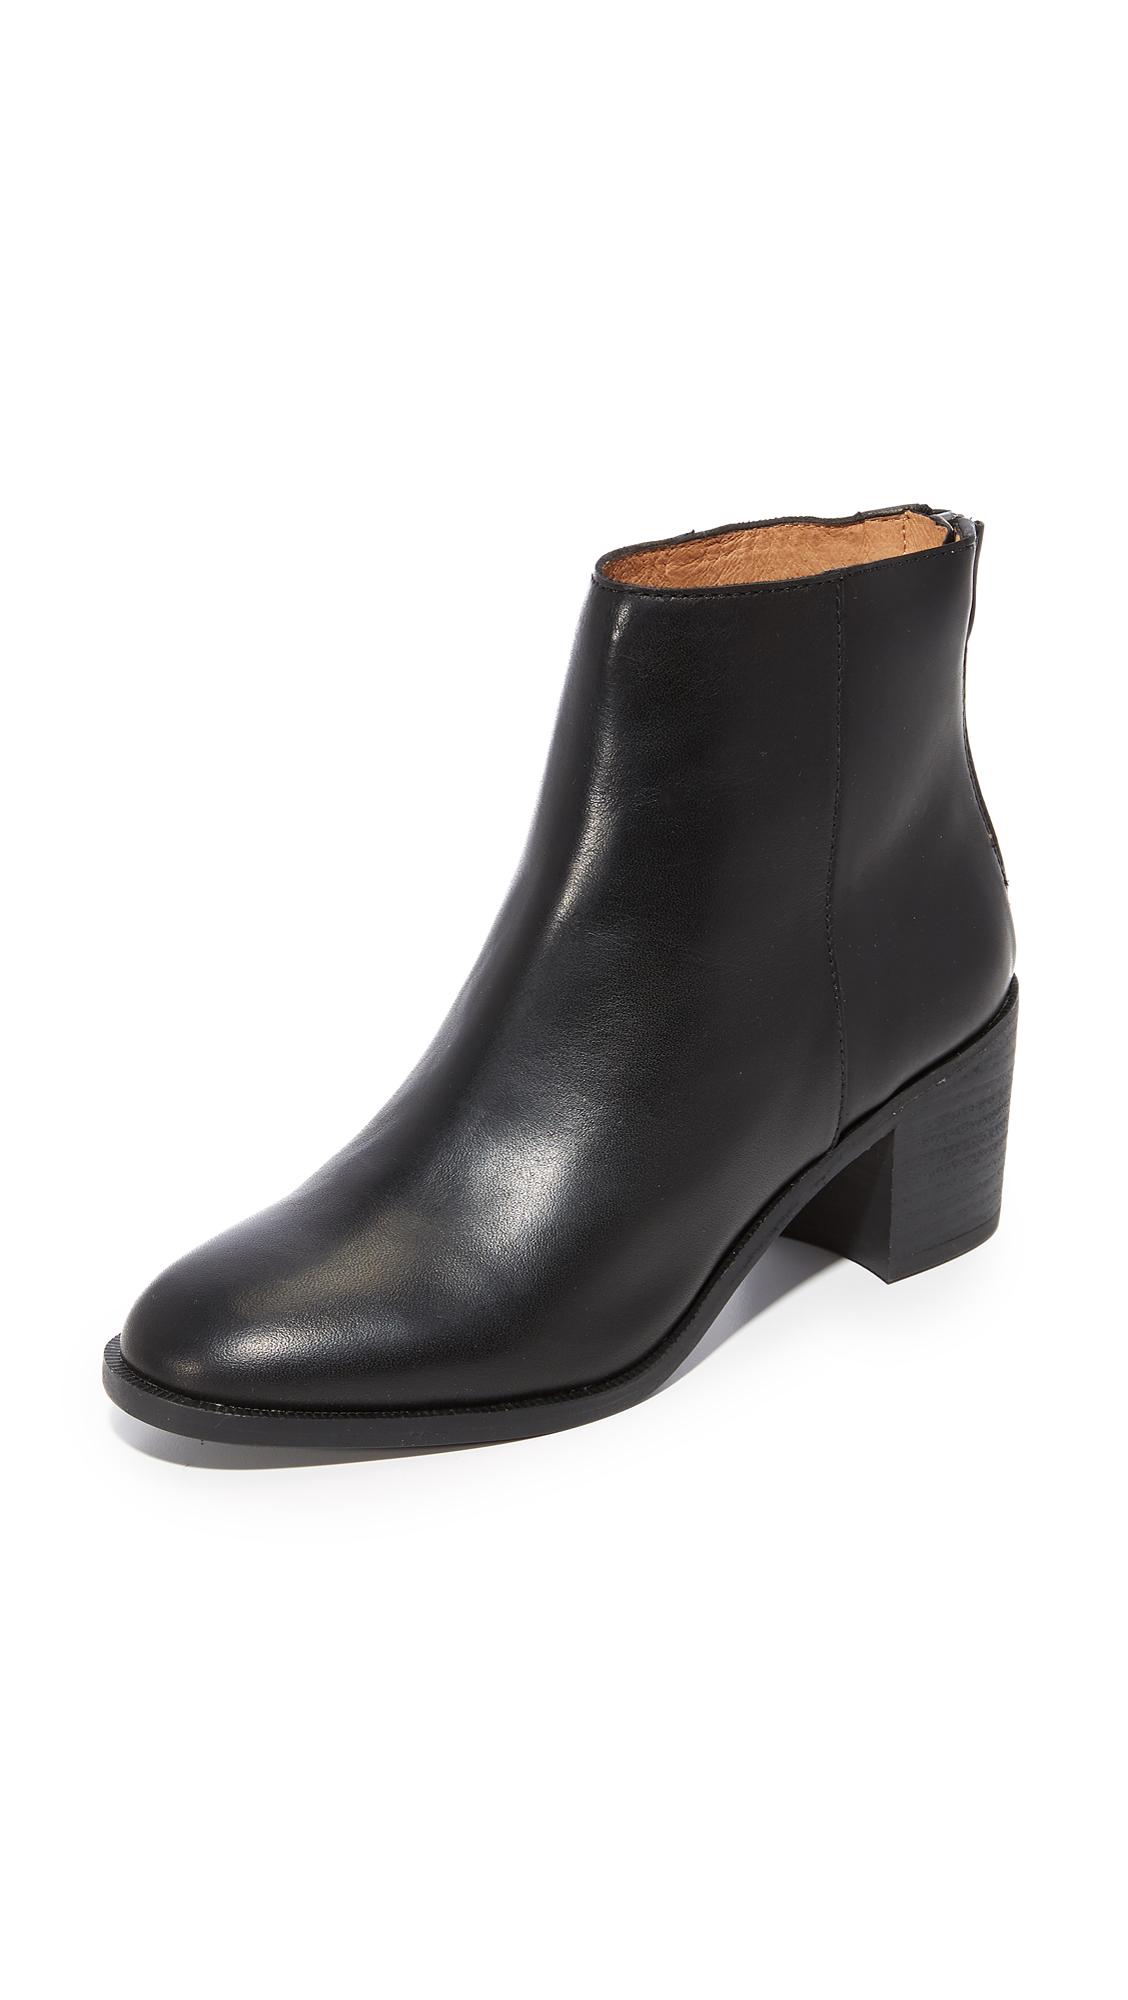 Madewell Pauline Boots - True Black